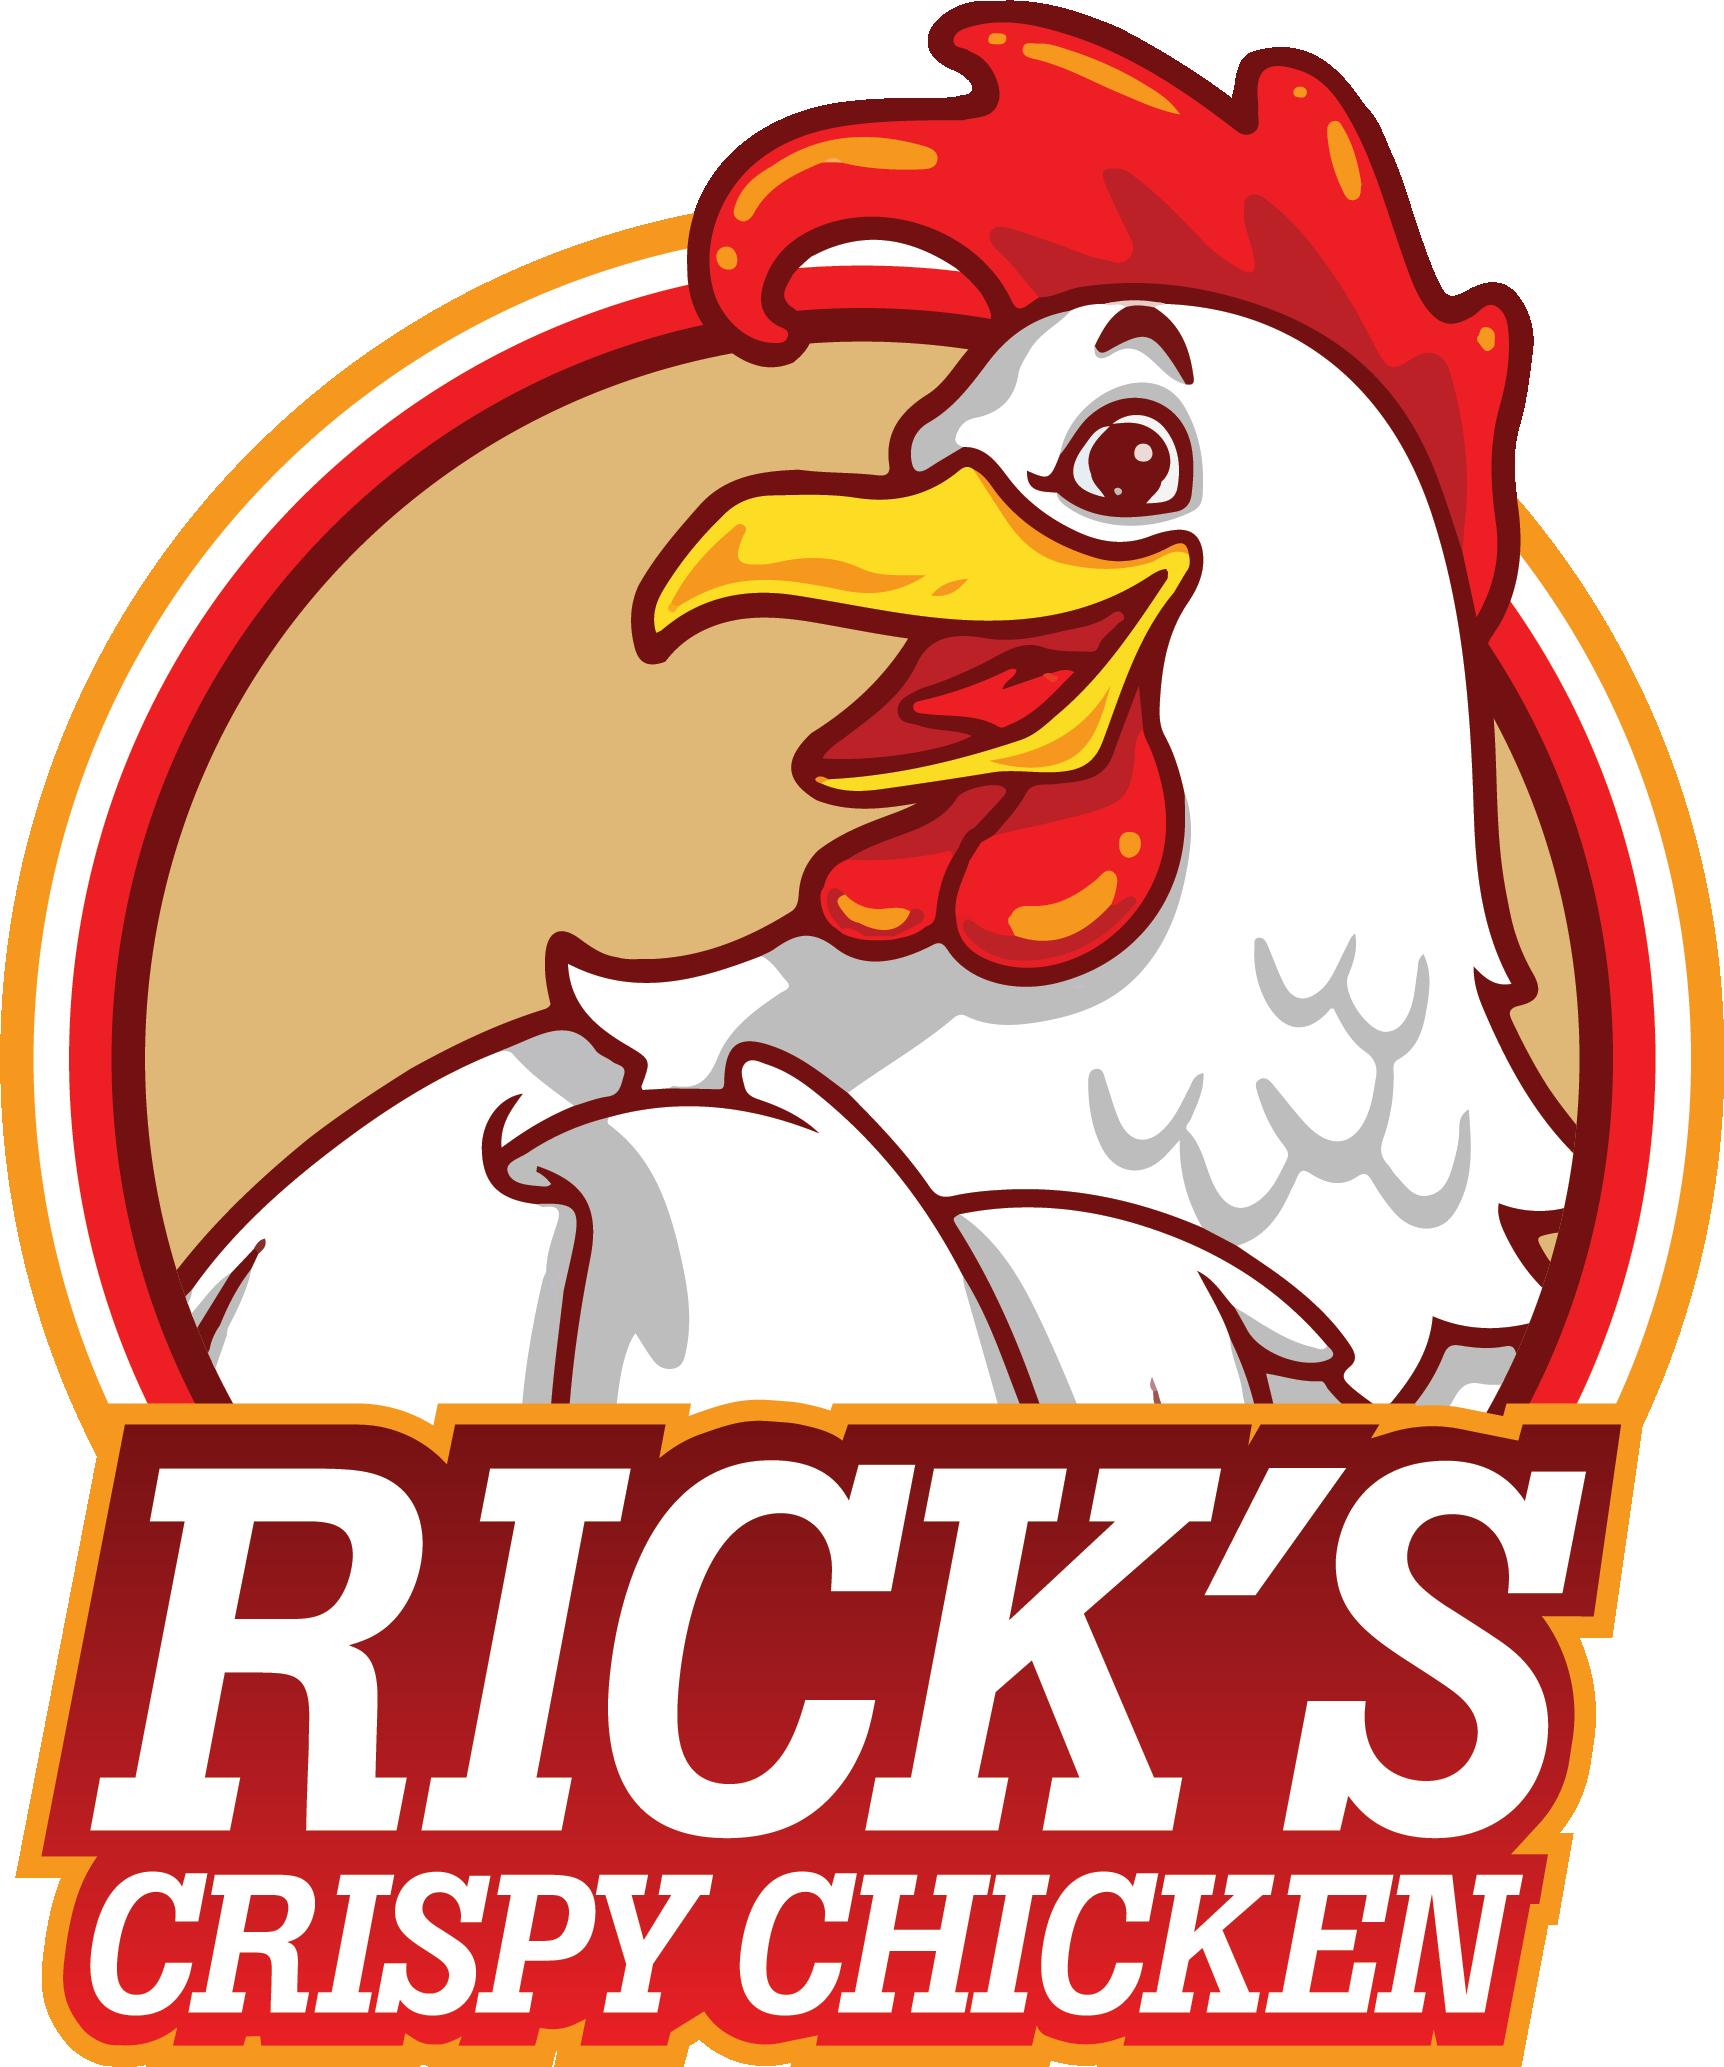 Rick's Crispy Chicken